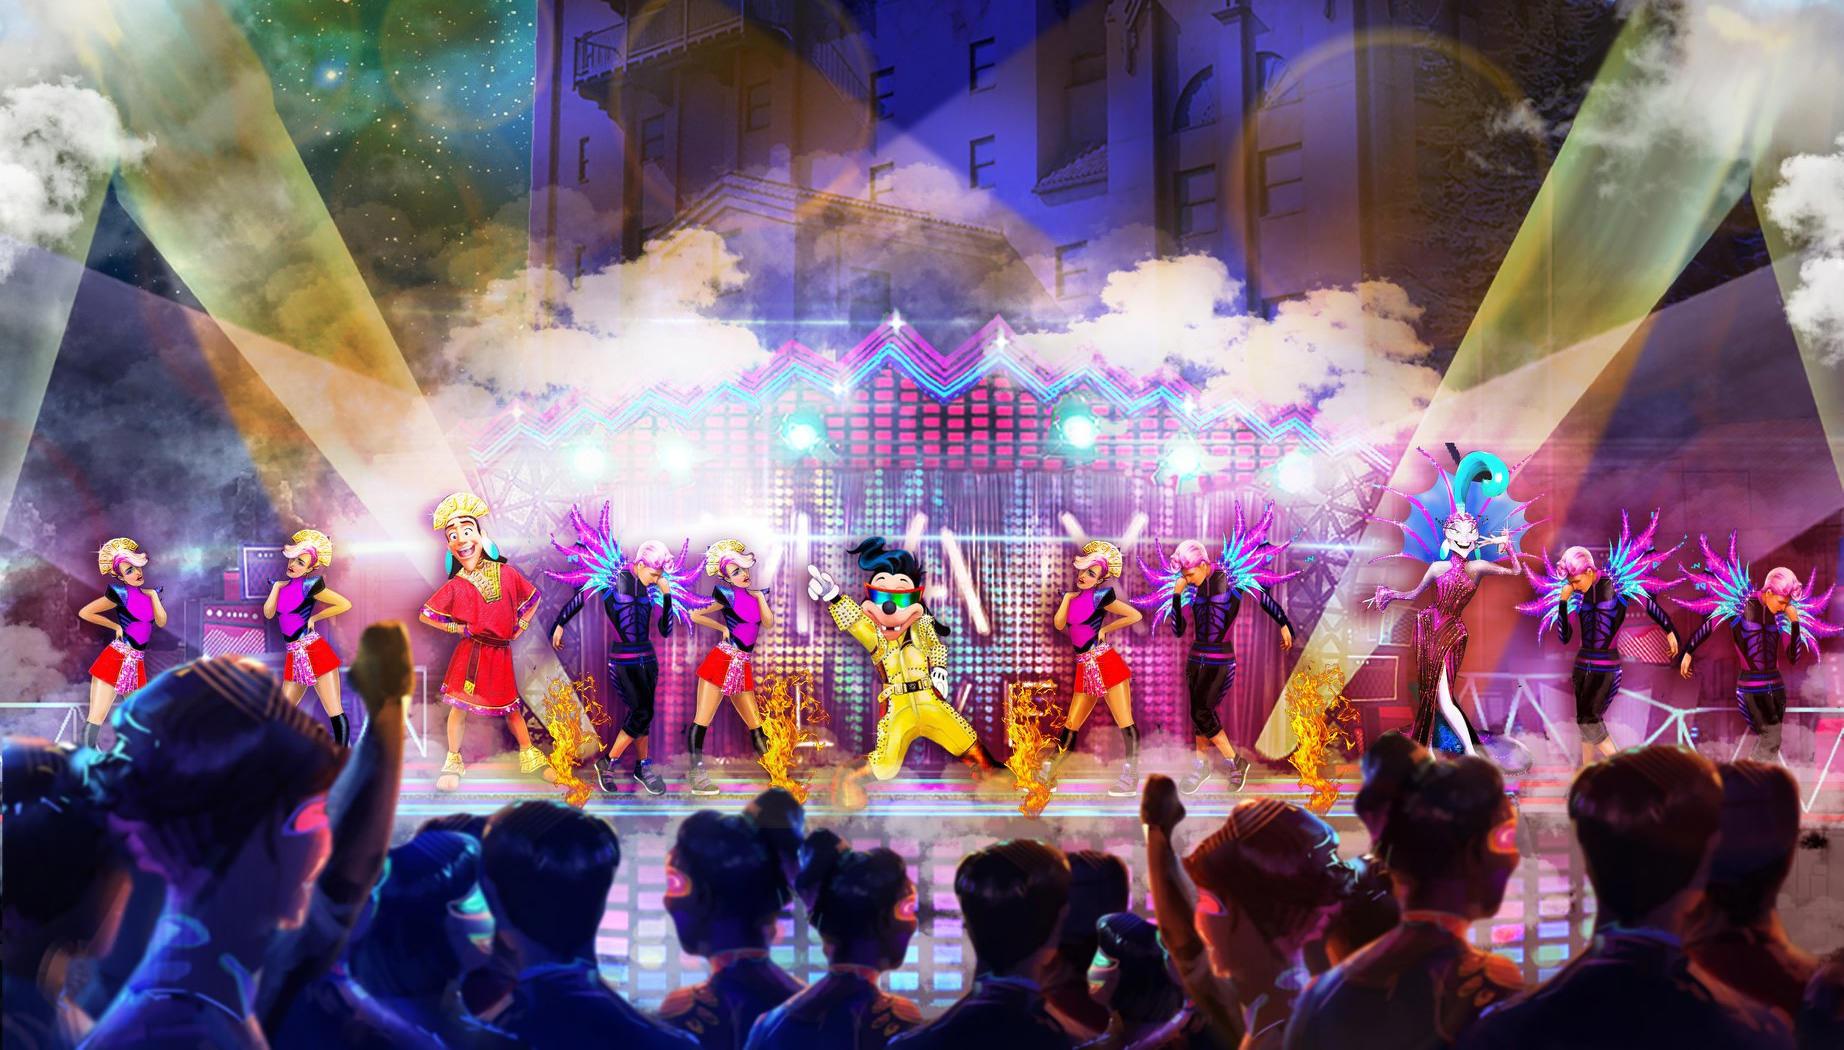 Soirée FanDaze Disneyland Paris 2018